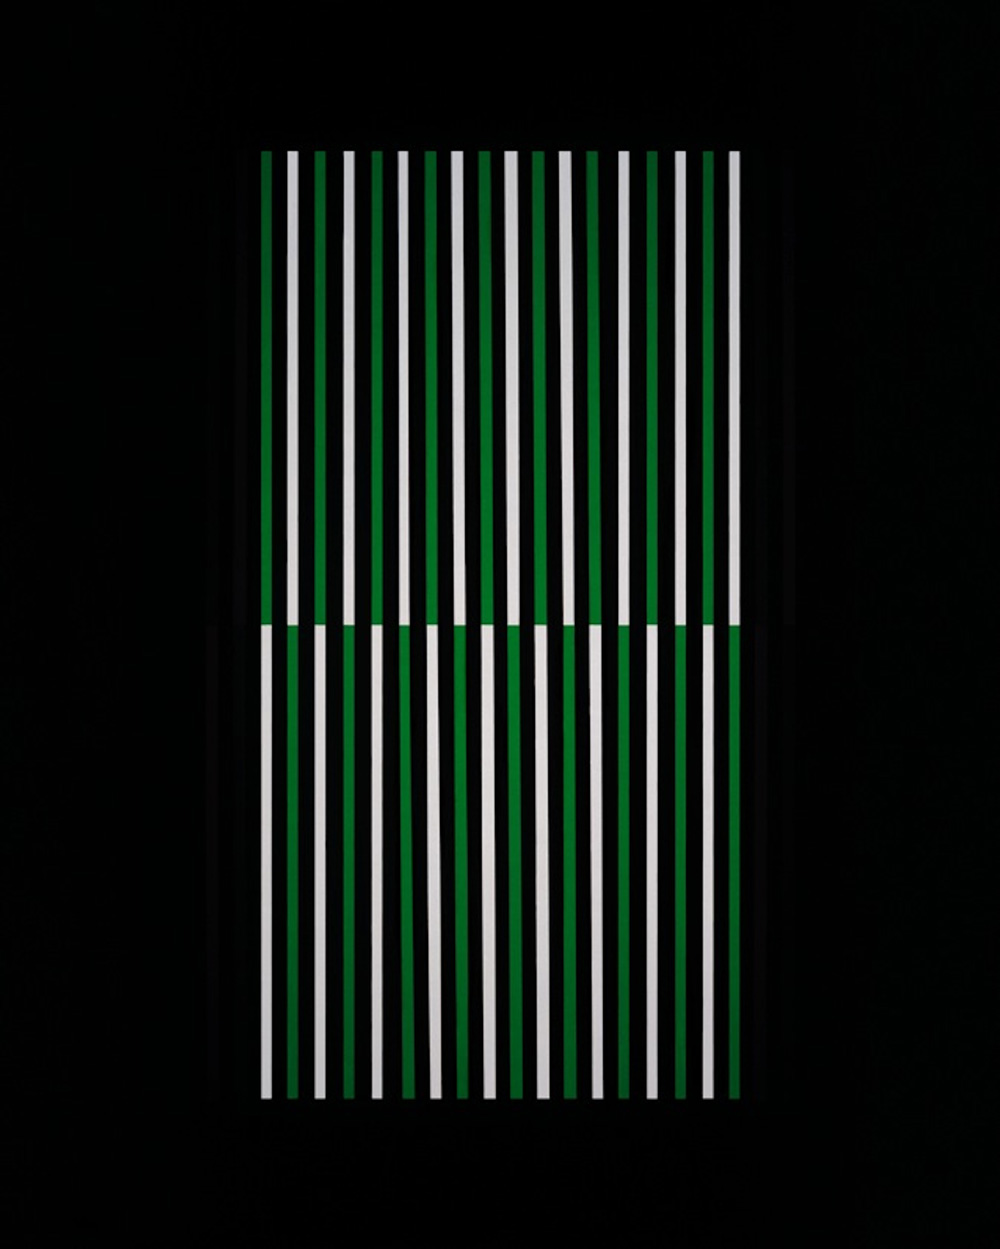 Richard Caldicott  'Multiple' 2006  C-print and Diasec  127 x 102 cm  Edition 1/5 +2AP